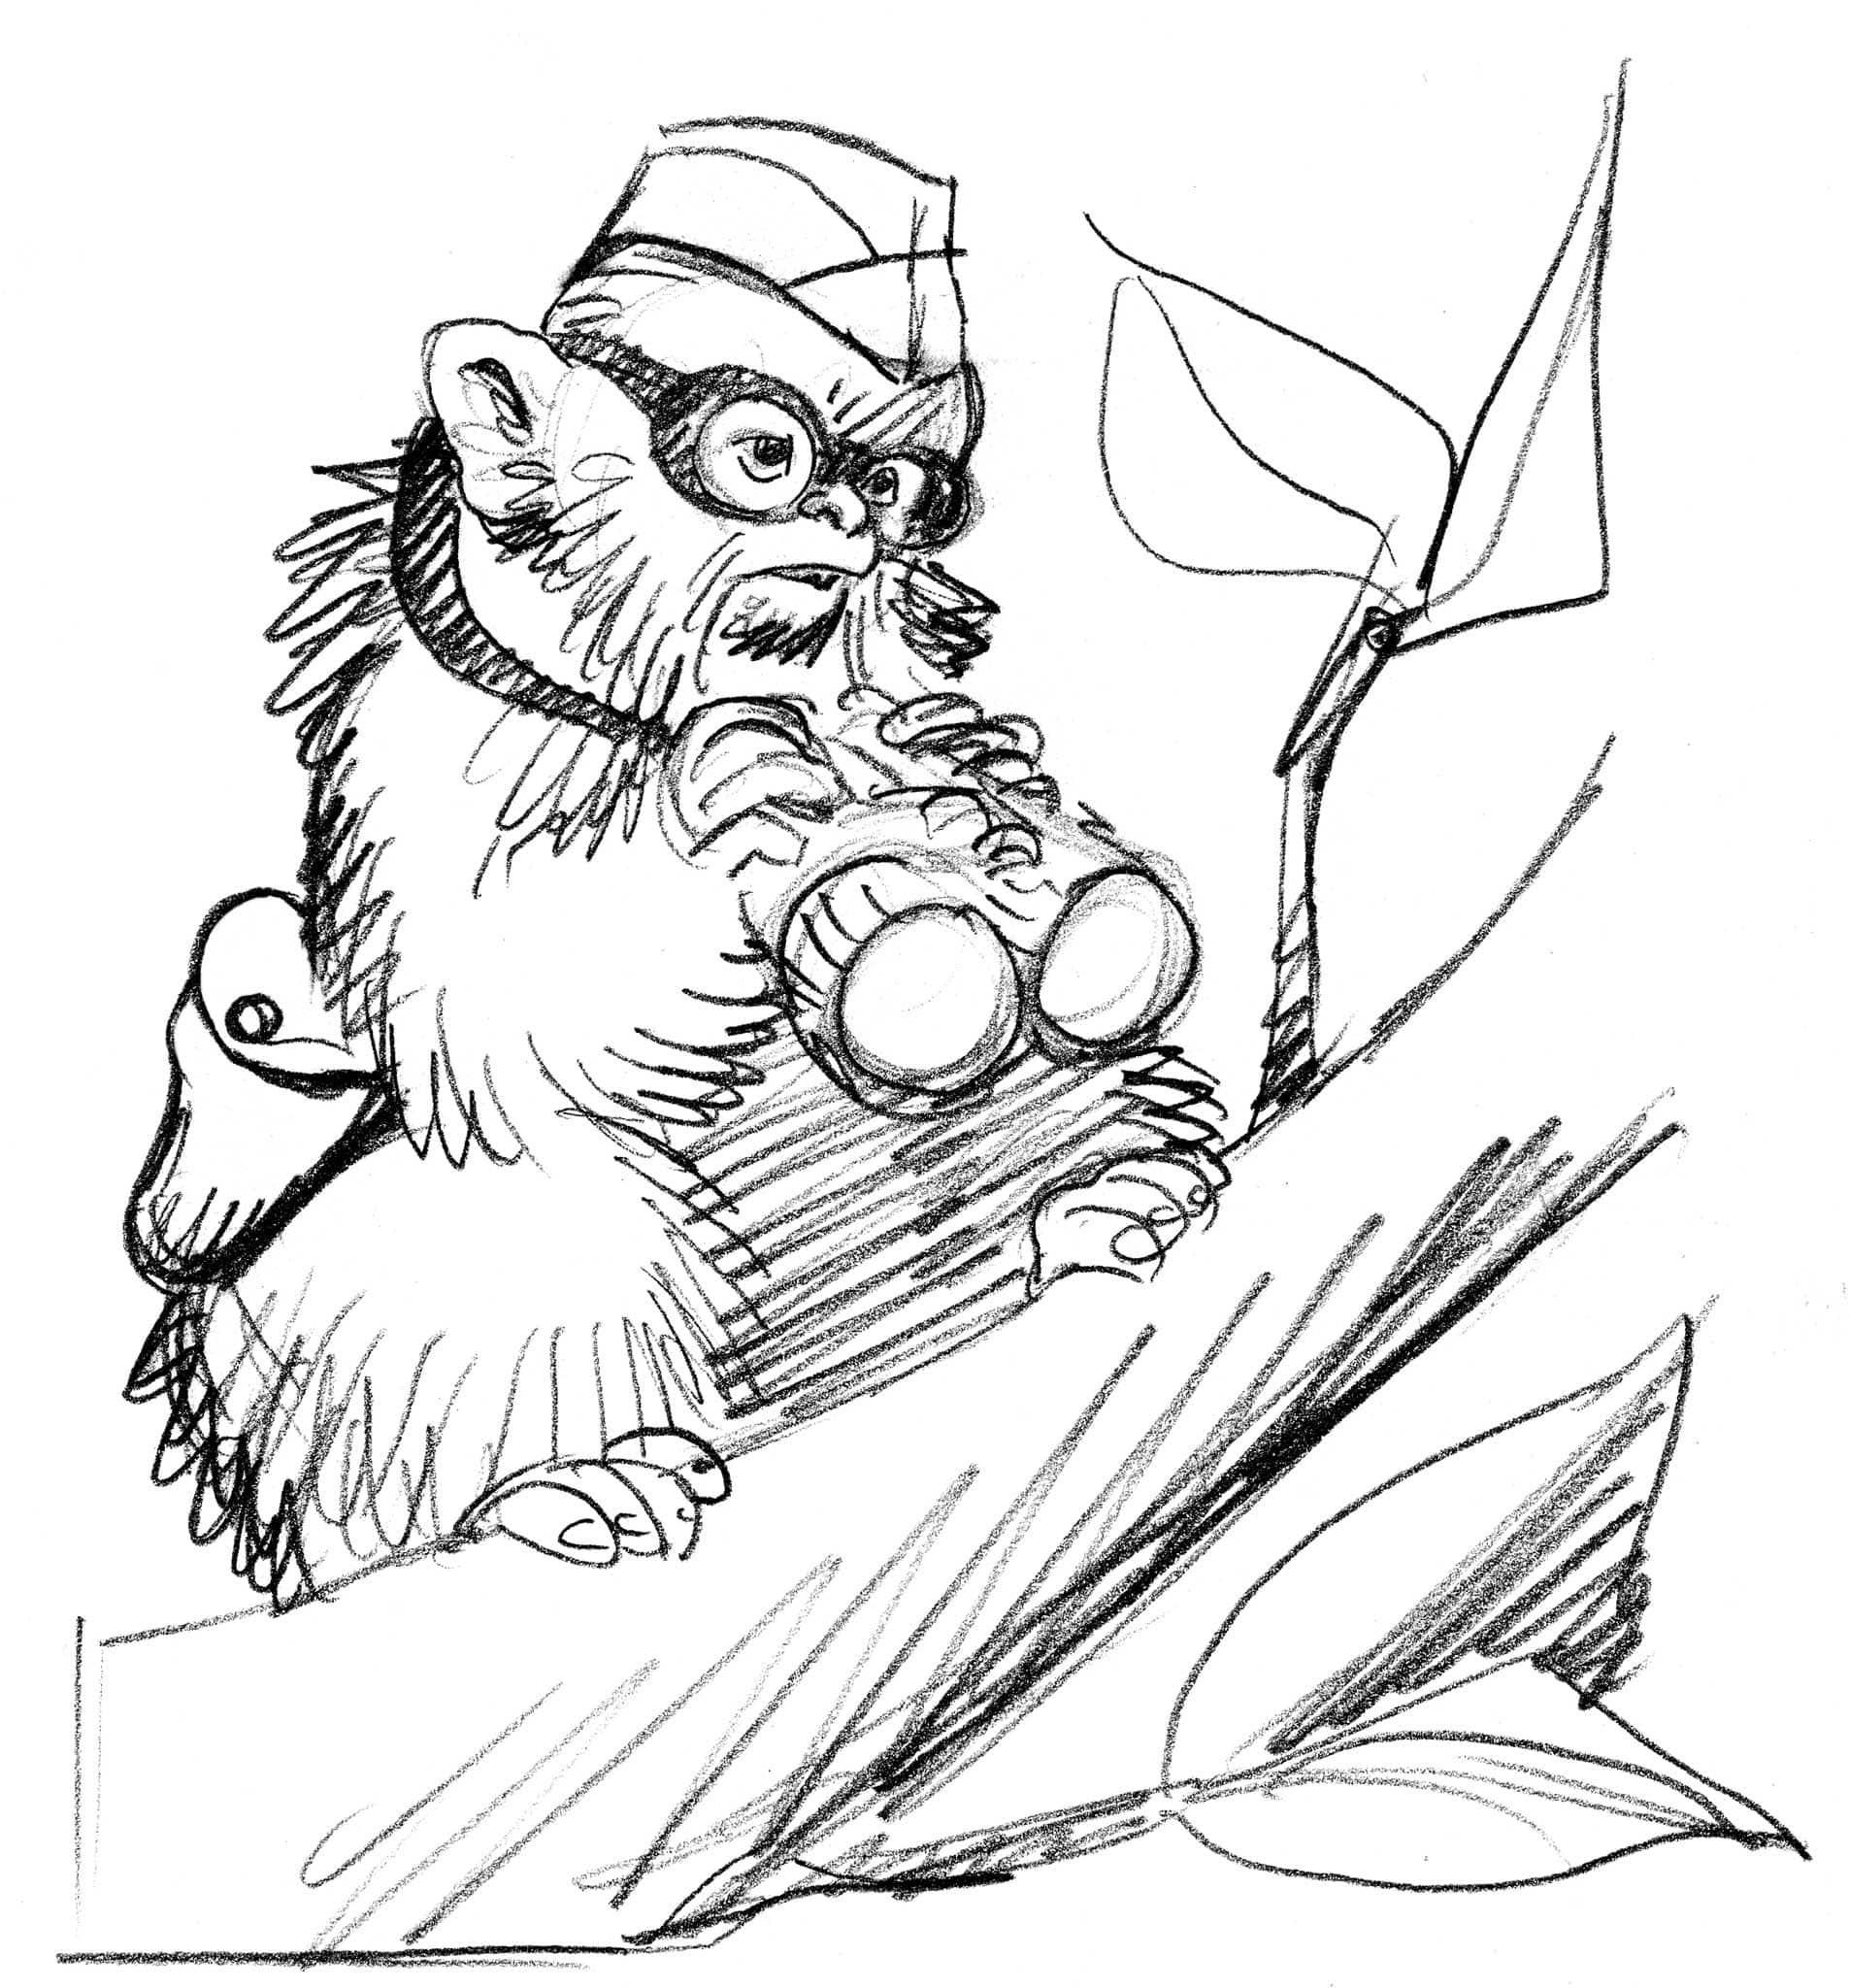 KH2900E-battle-monkeys-marmoset-scout